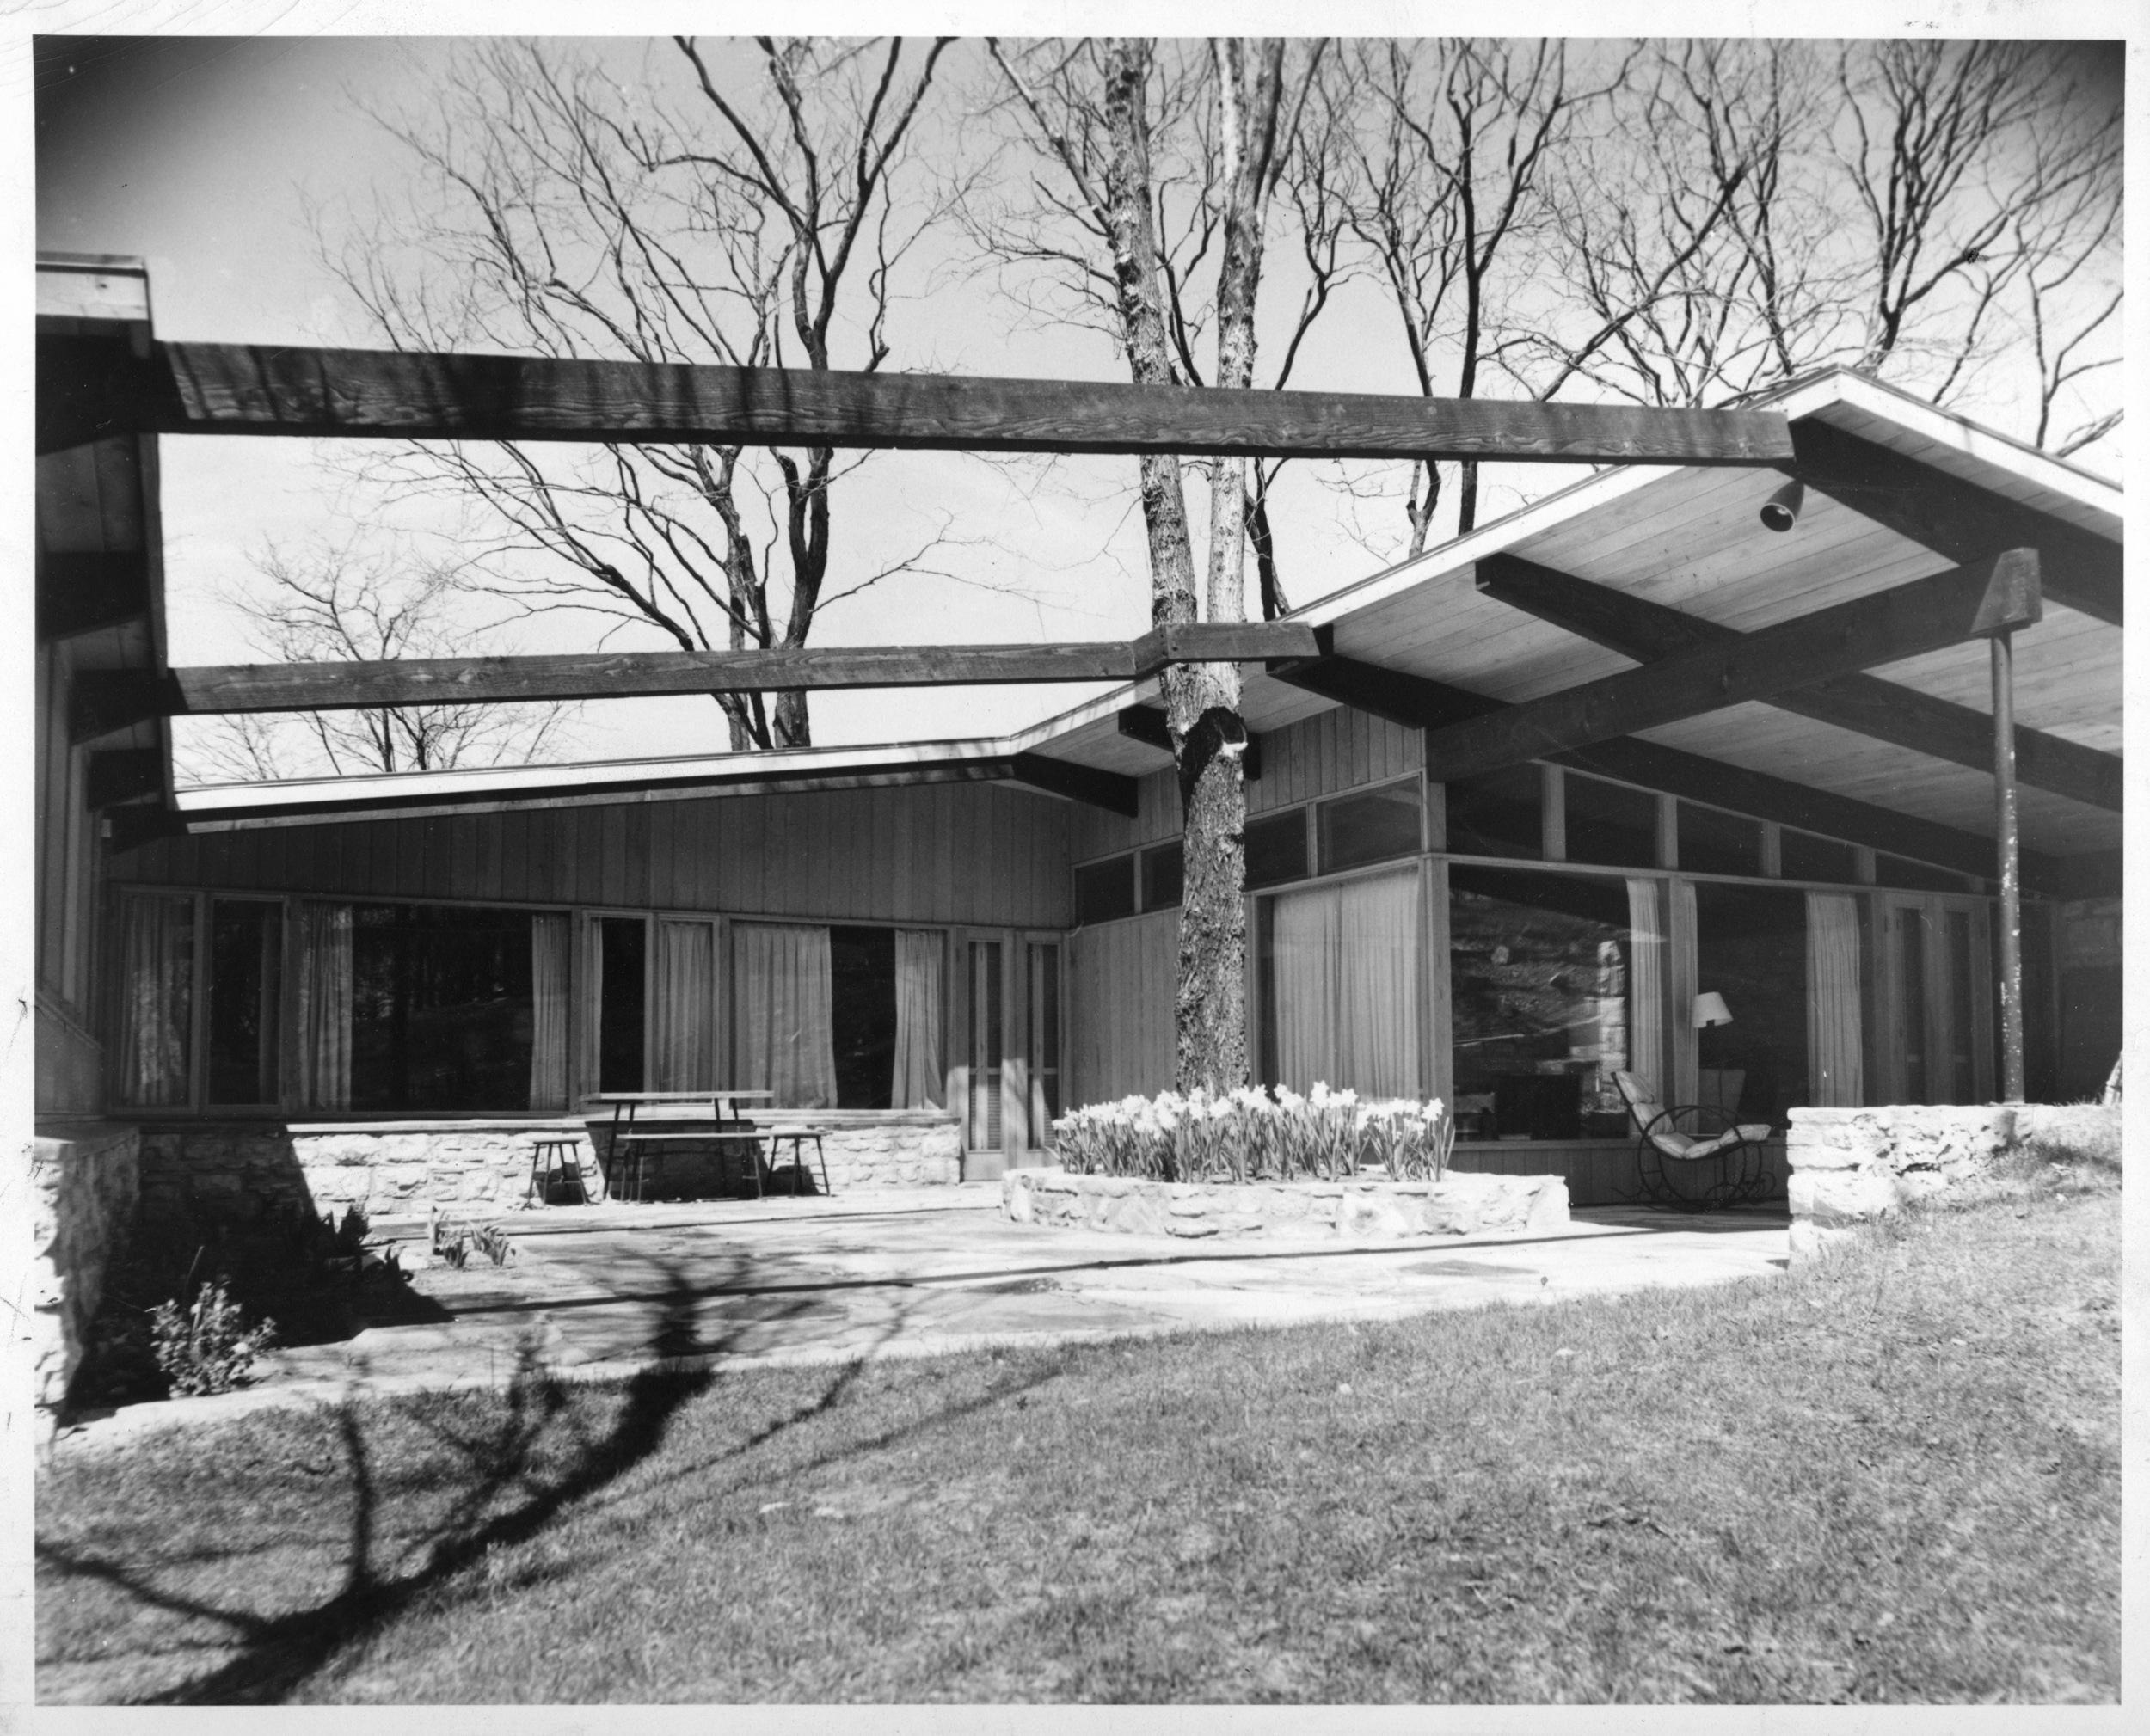 Reed Residence - Leawood Kansas - Architect, David B. Runnells